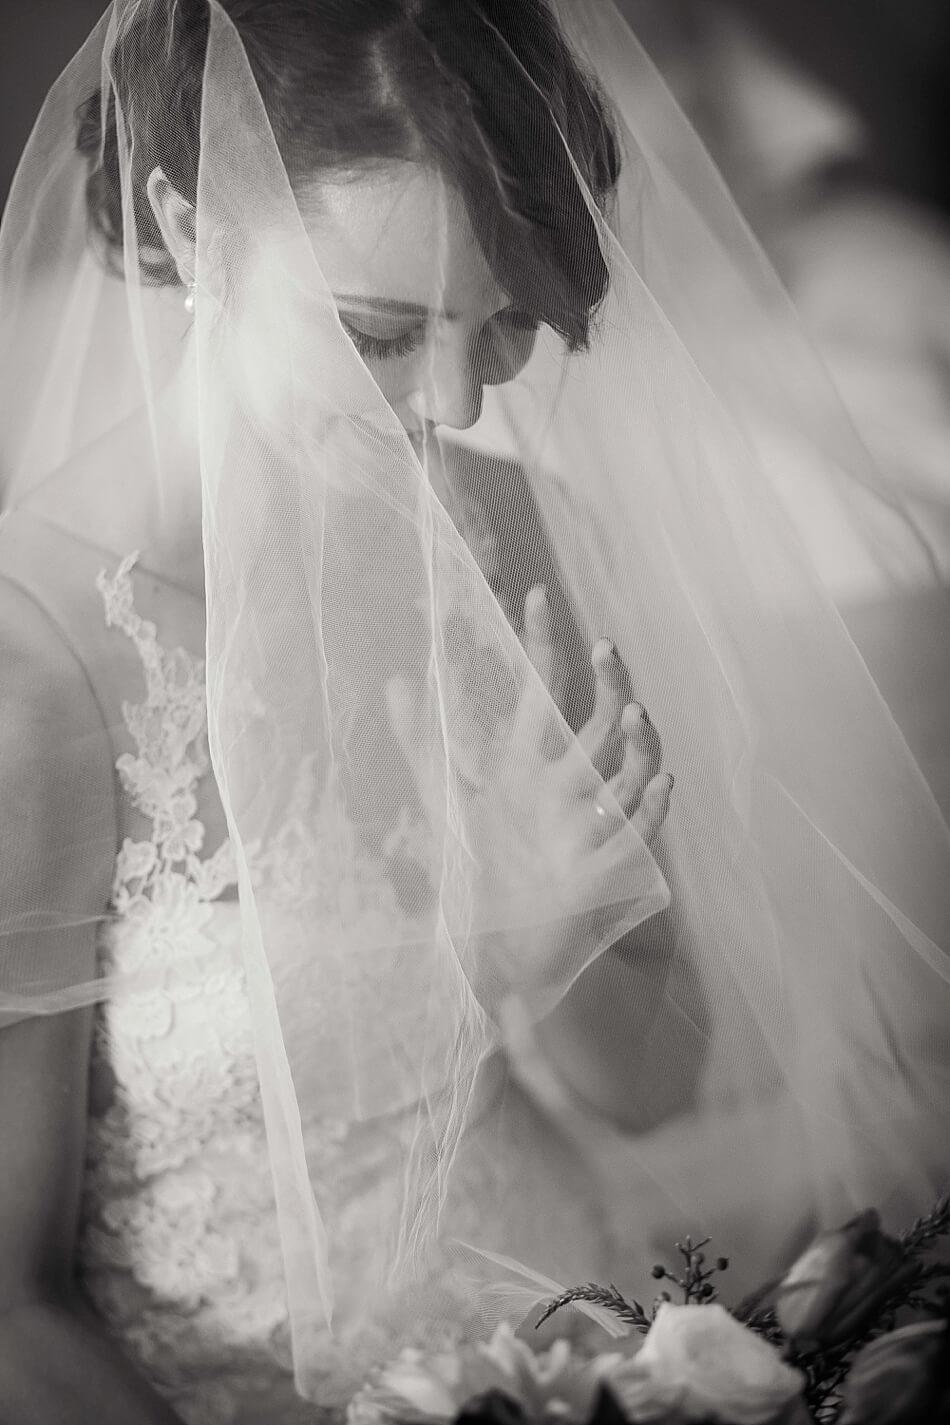 nikki-meyer_landtscap_stellenbosch_wedding_photographer_023